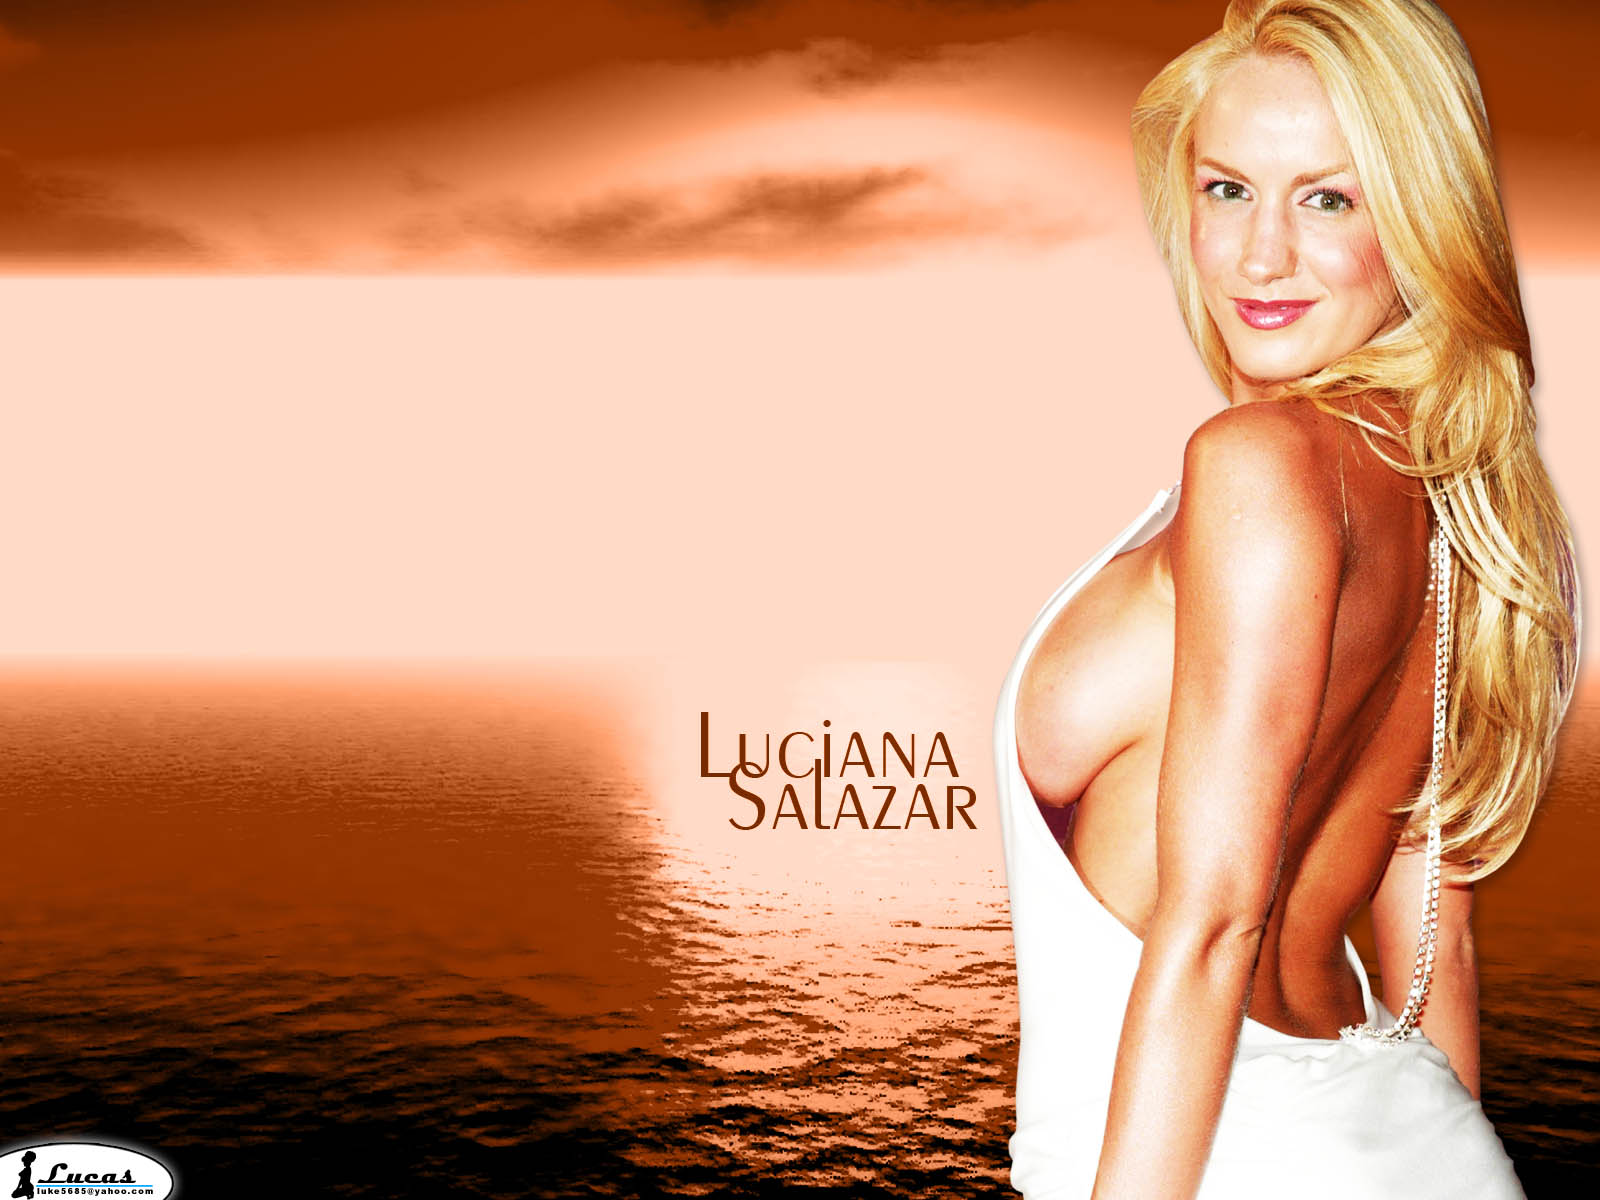 Download Luciana Salazar Wallpaper